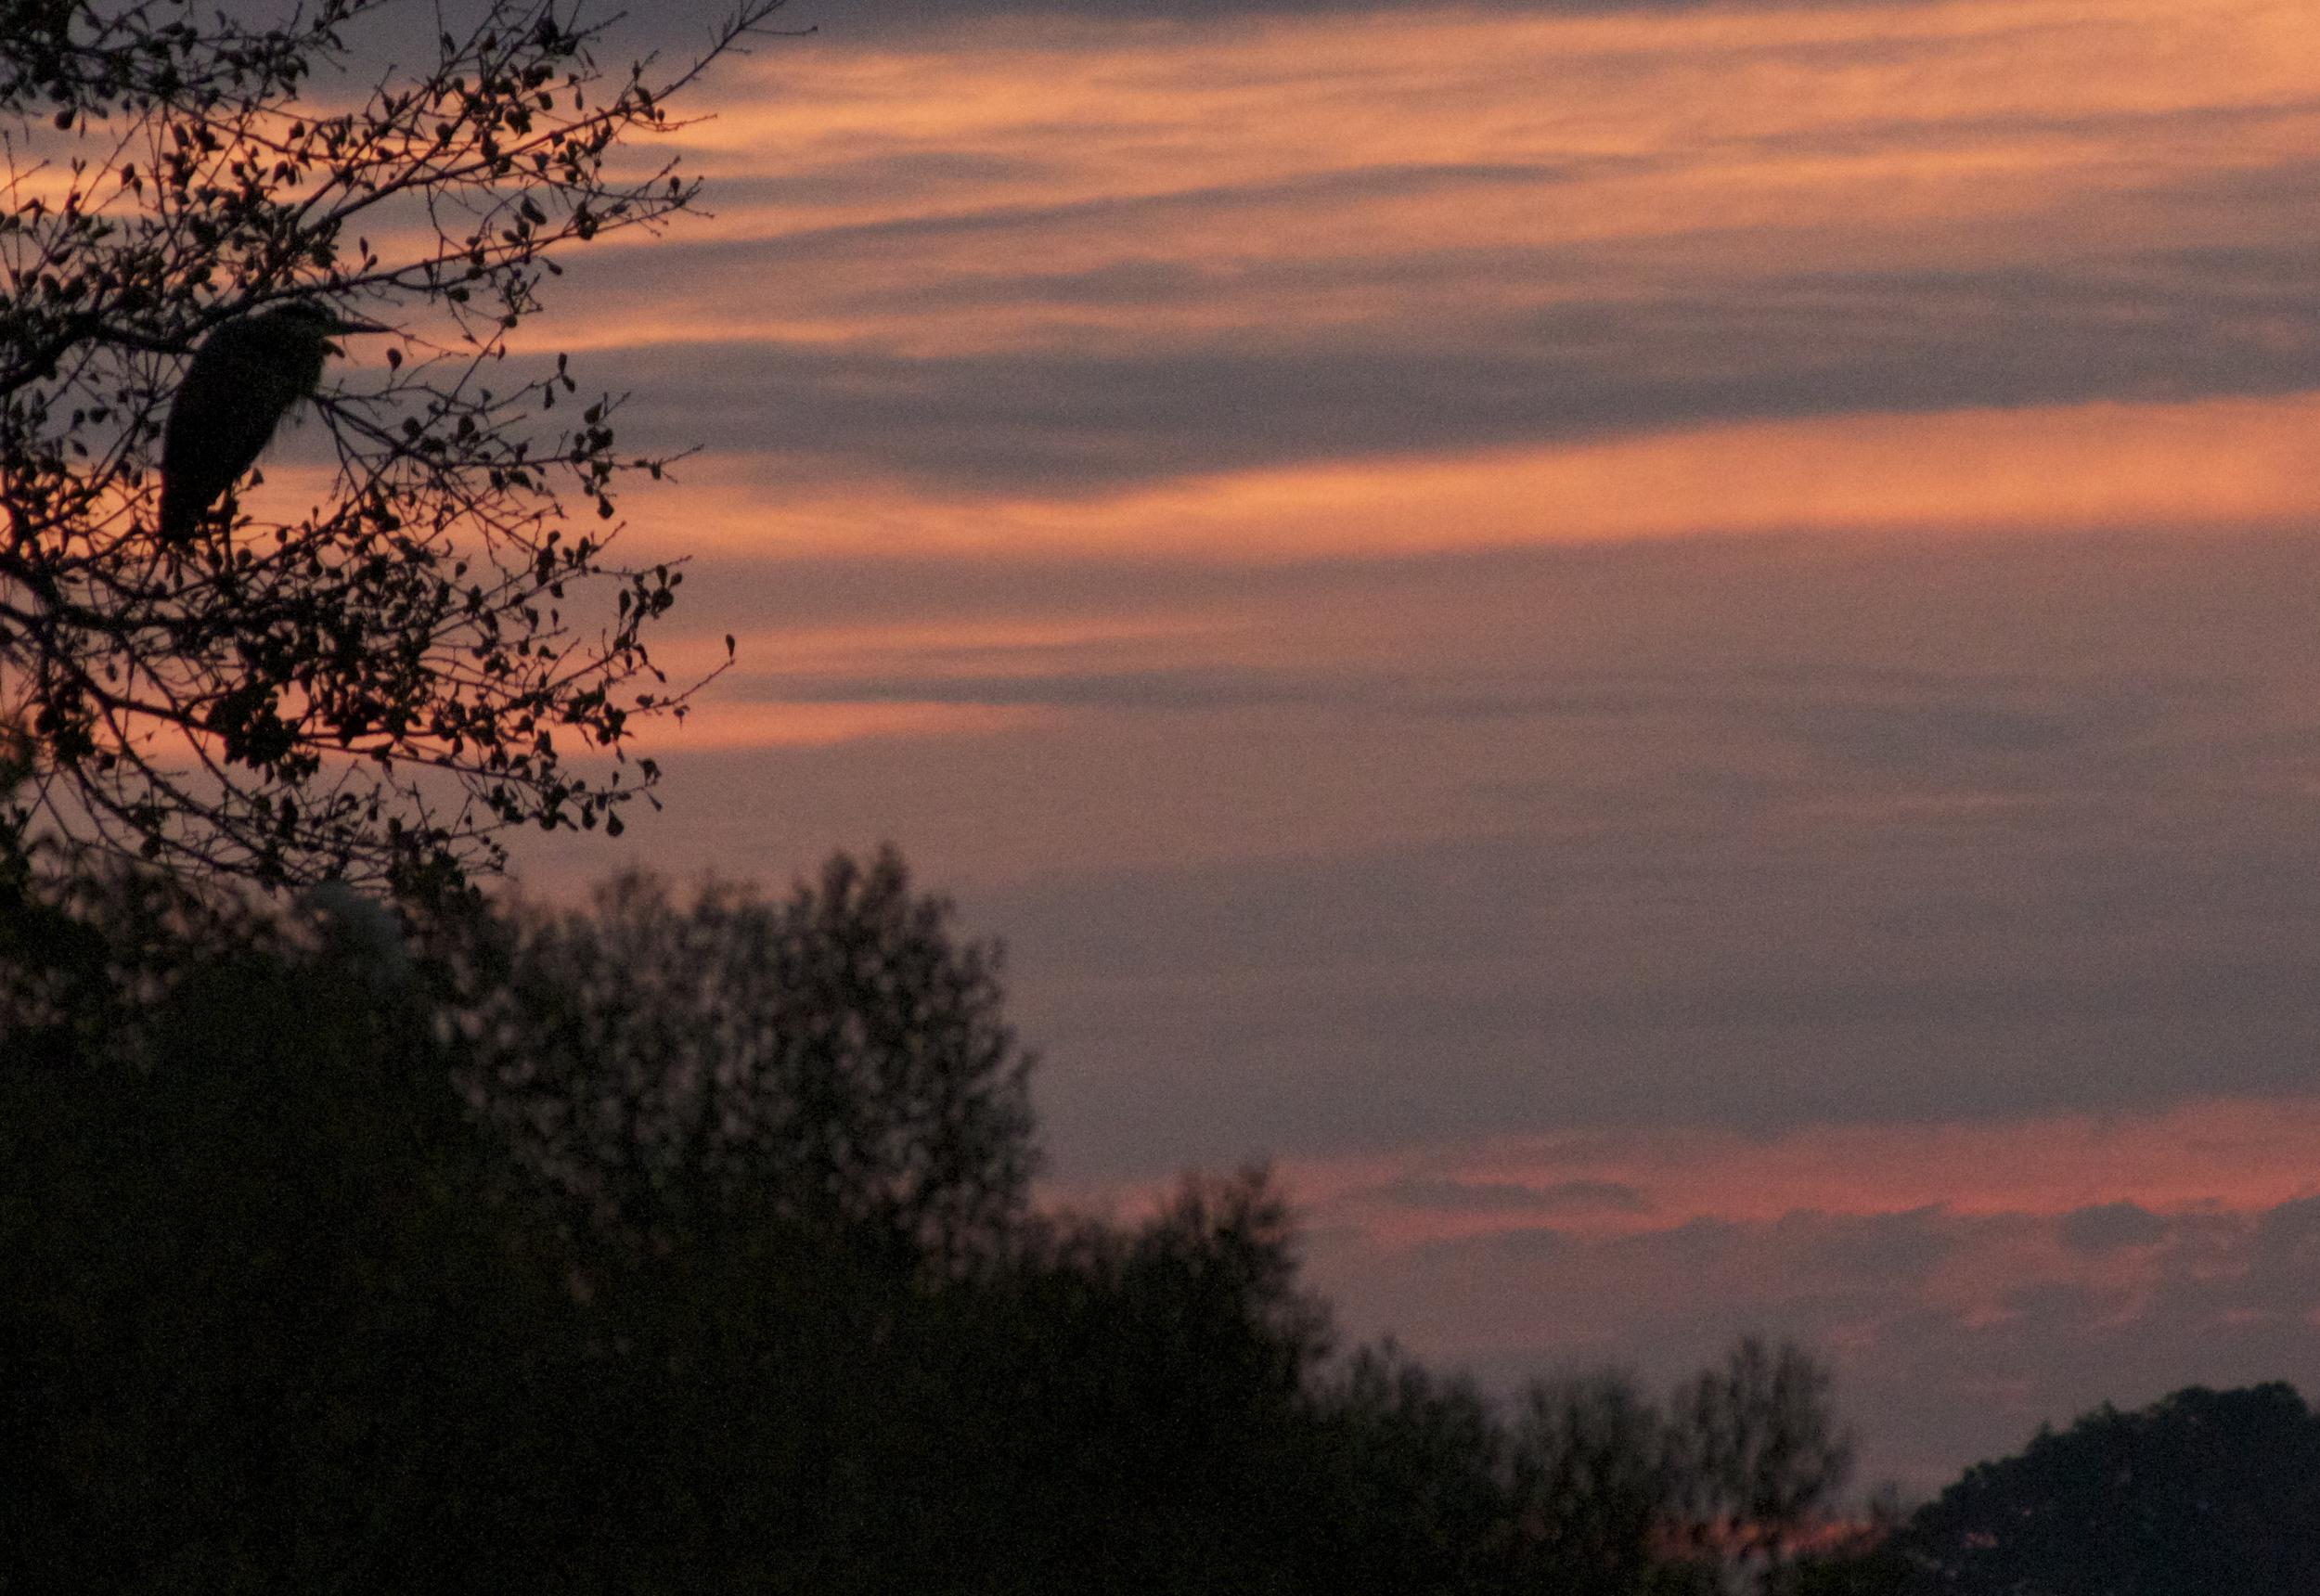 Old Man River observes Red Sky in Morning. Herons take warning.